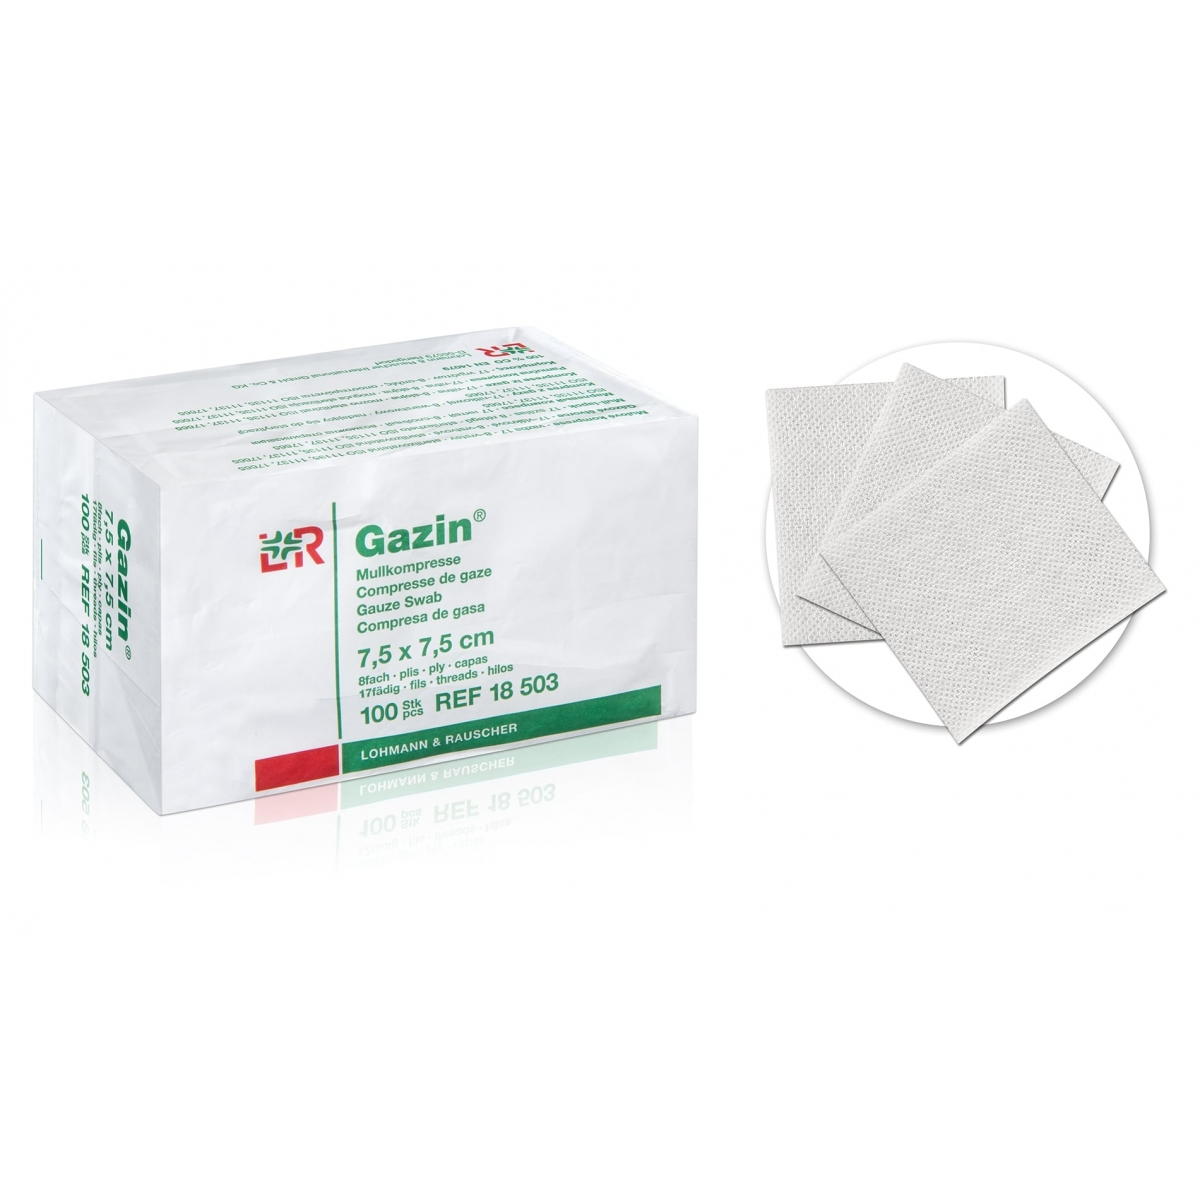 Hygiène - No Name - COMPRESSE DE GAZE NON STERILE 7,5 cm x 7,5 cm (x100)